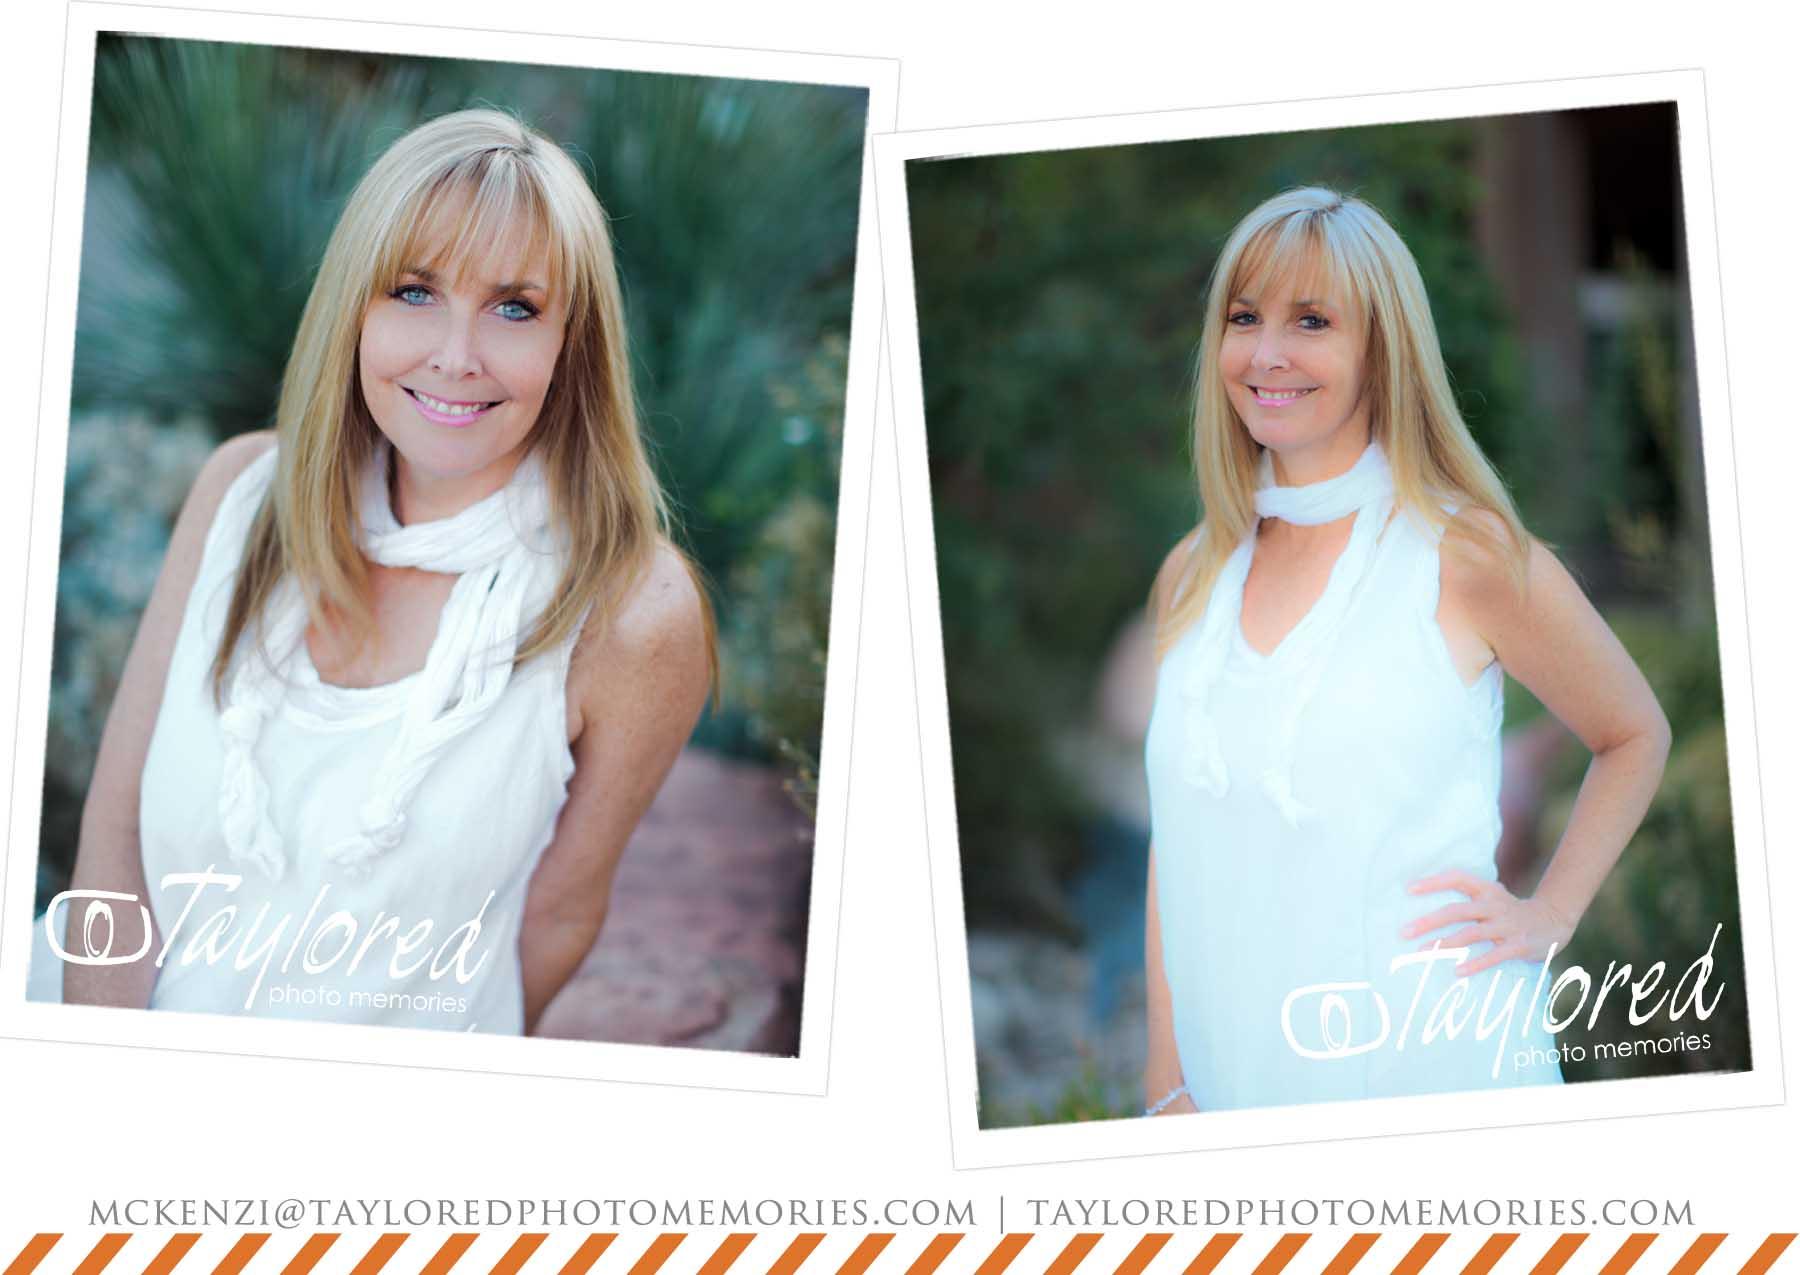 Adventure Wedding Photographer - Las Vegas Head Shots - Taylored Photo Memories 1